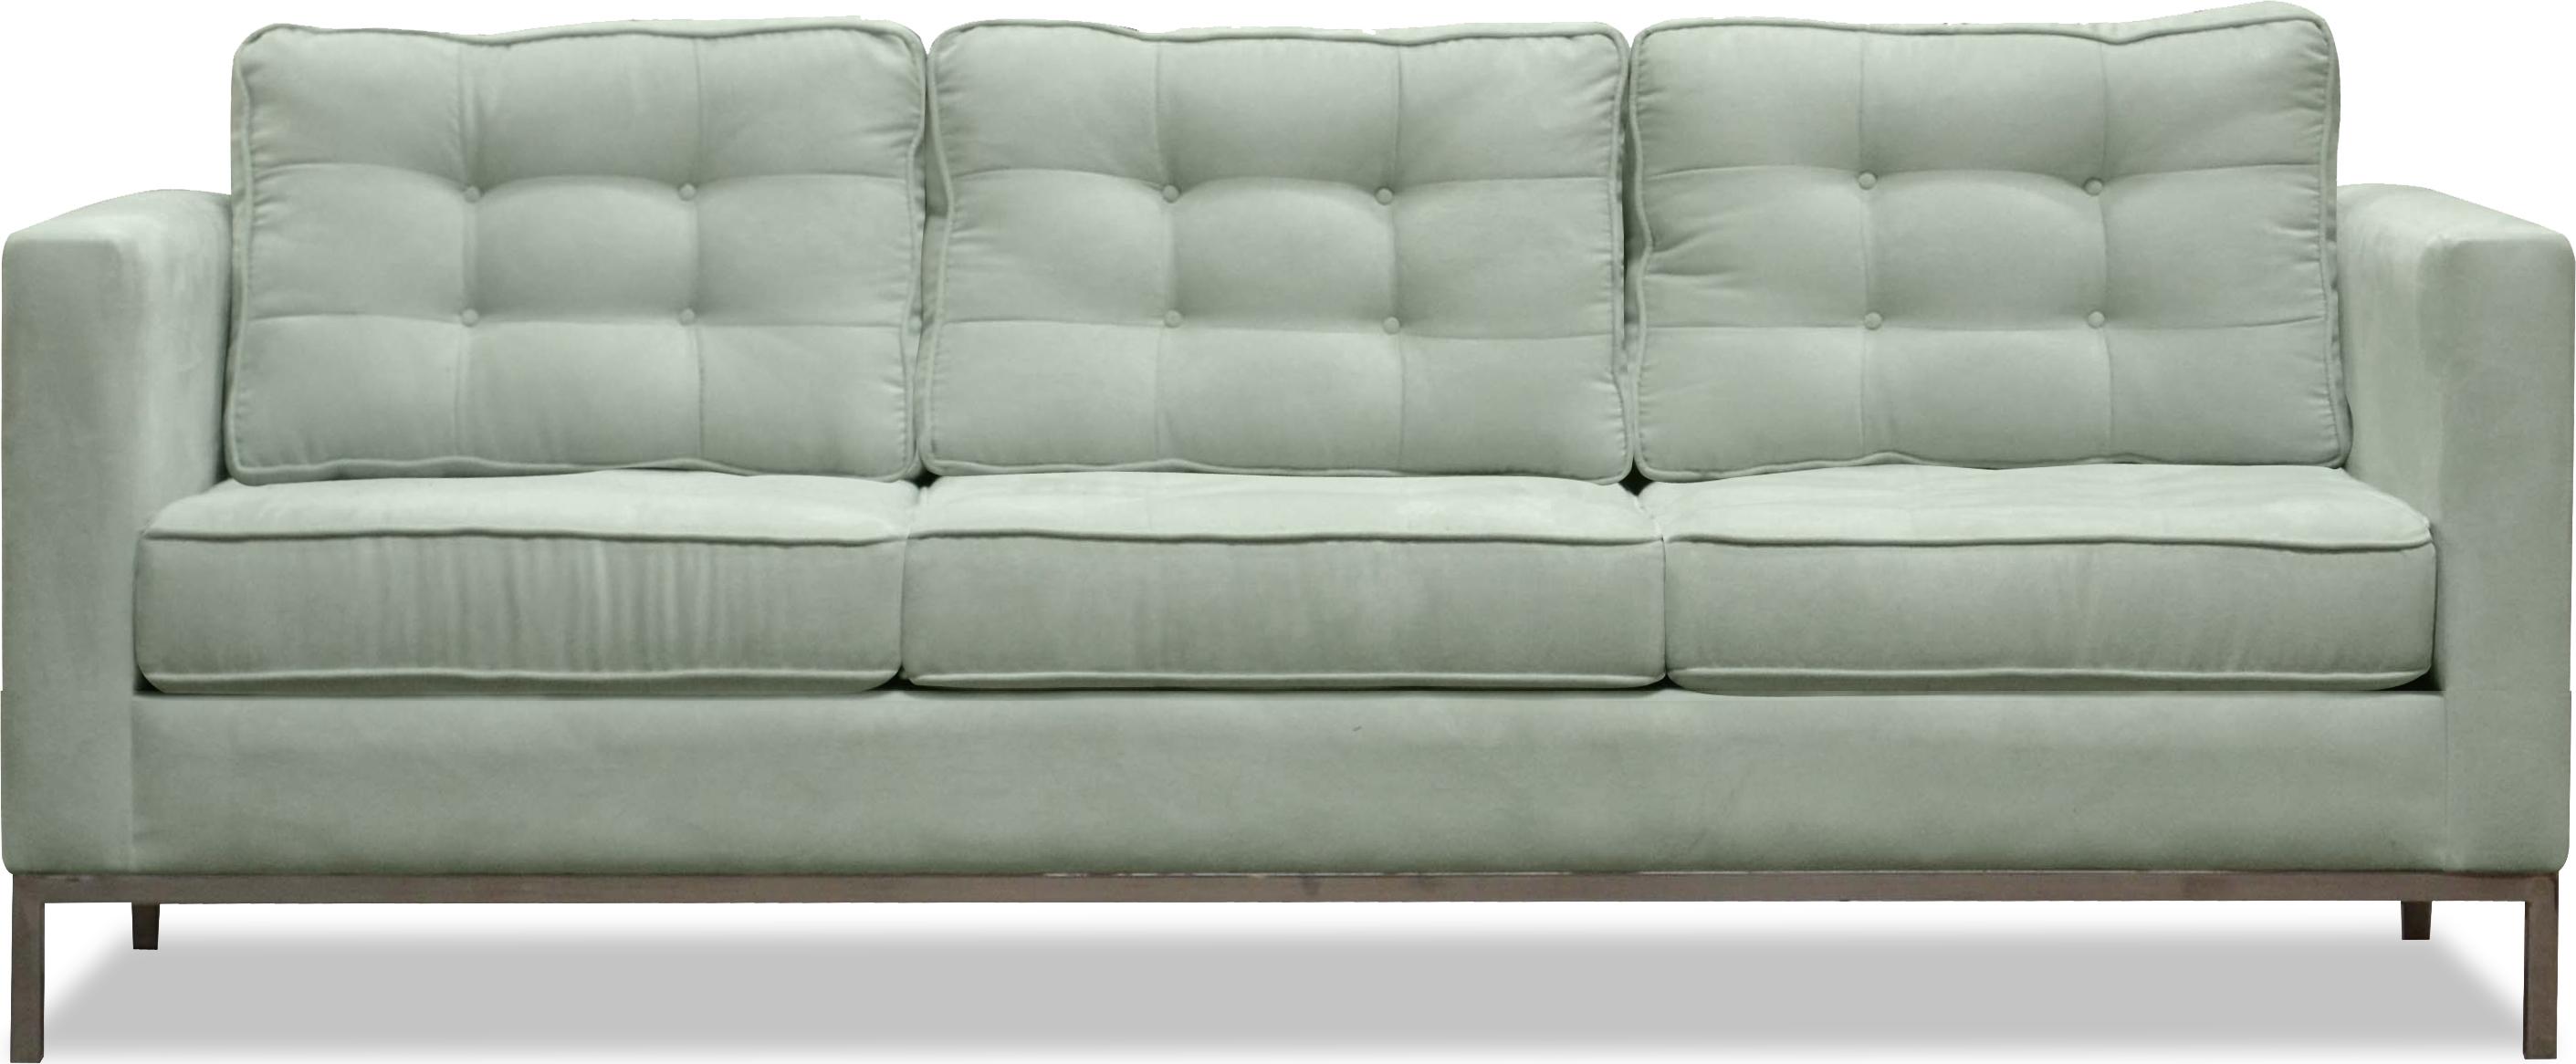 The Sofa pany Uno Sofas Couches Custom Slipcover Sofas